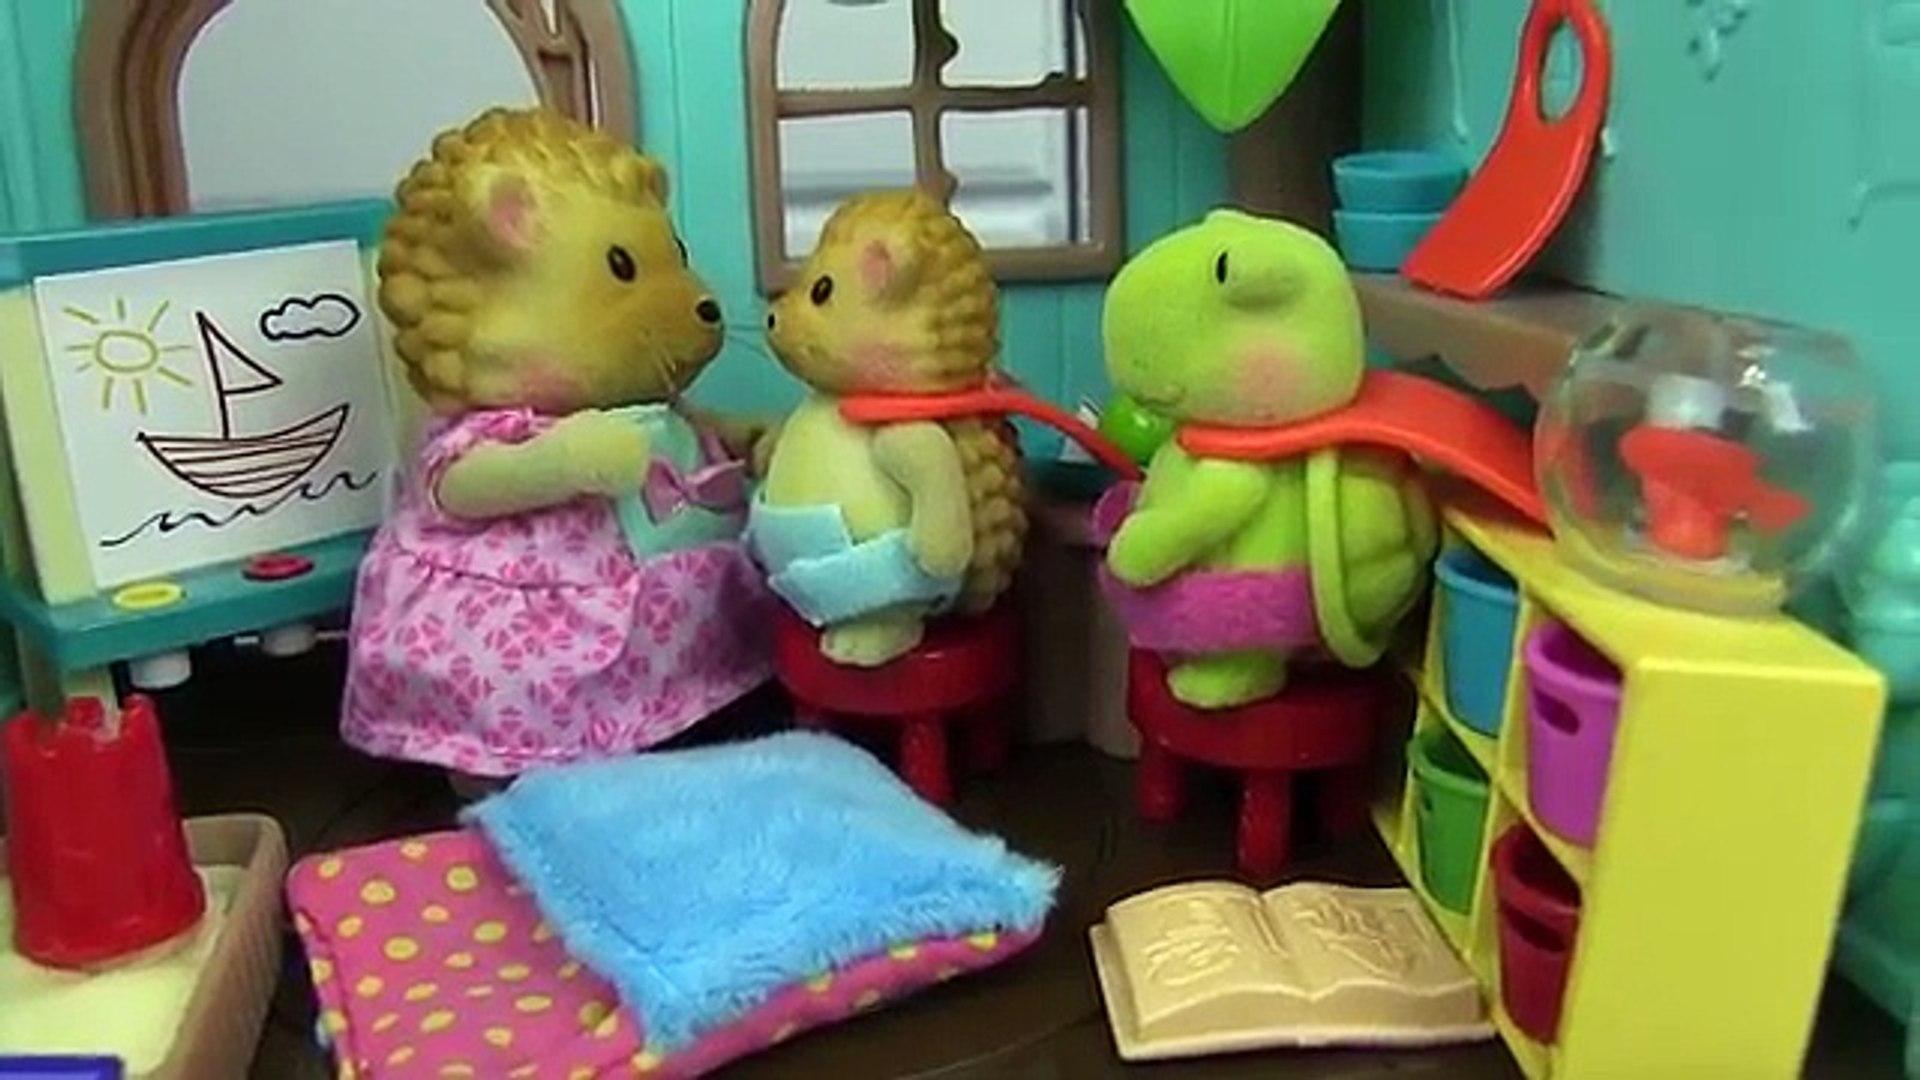 Oso de lindo huevo familia gigante súper sorpresa juguete casa del árbol Lil woodzeez kidfriendly